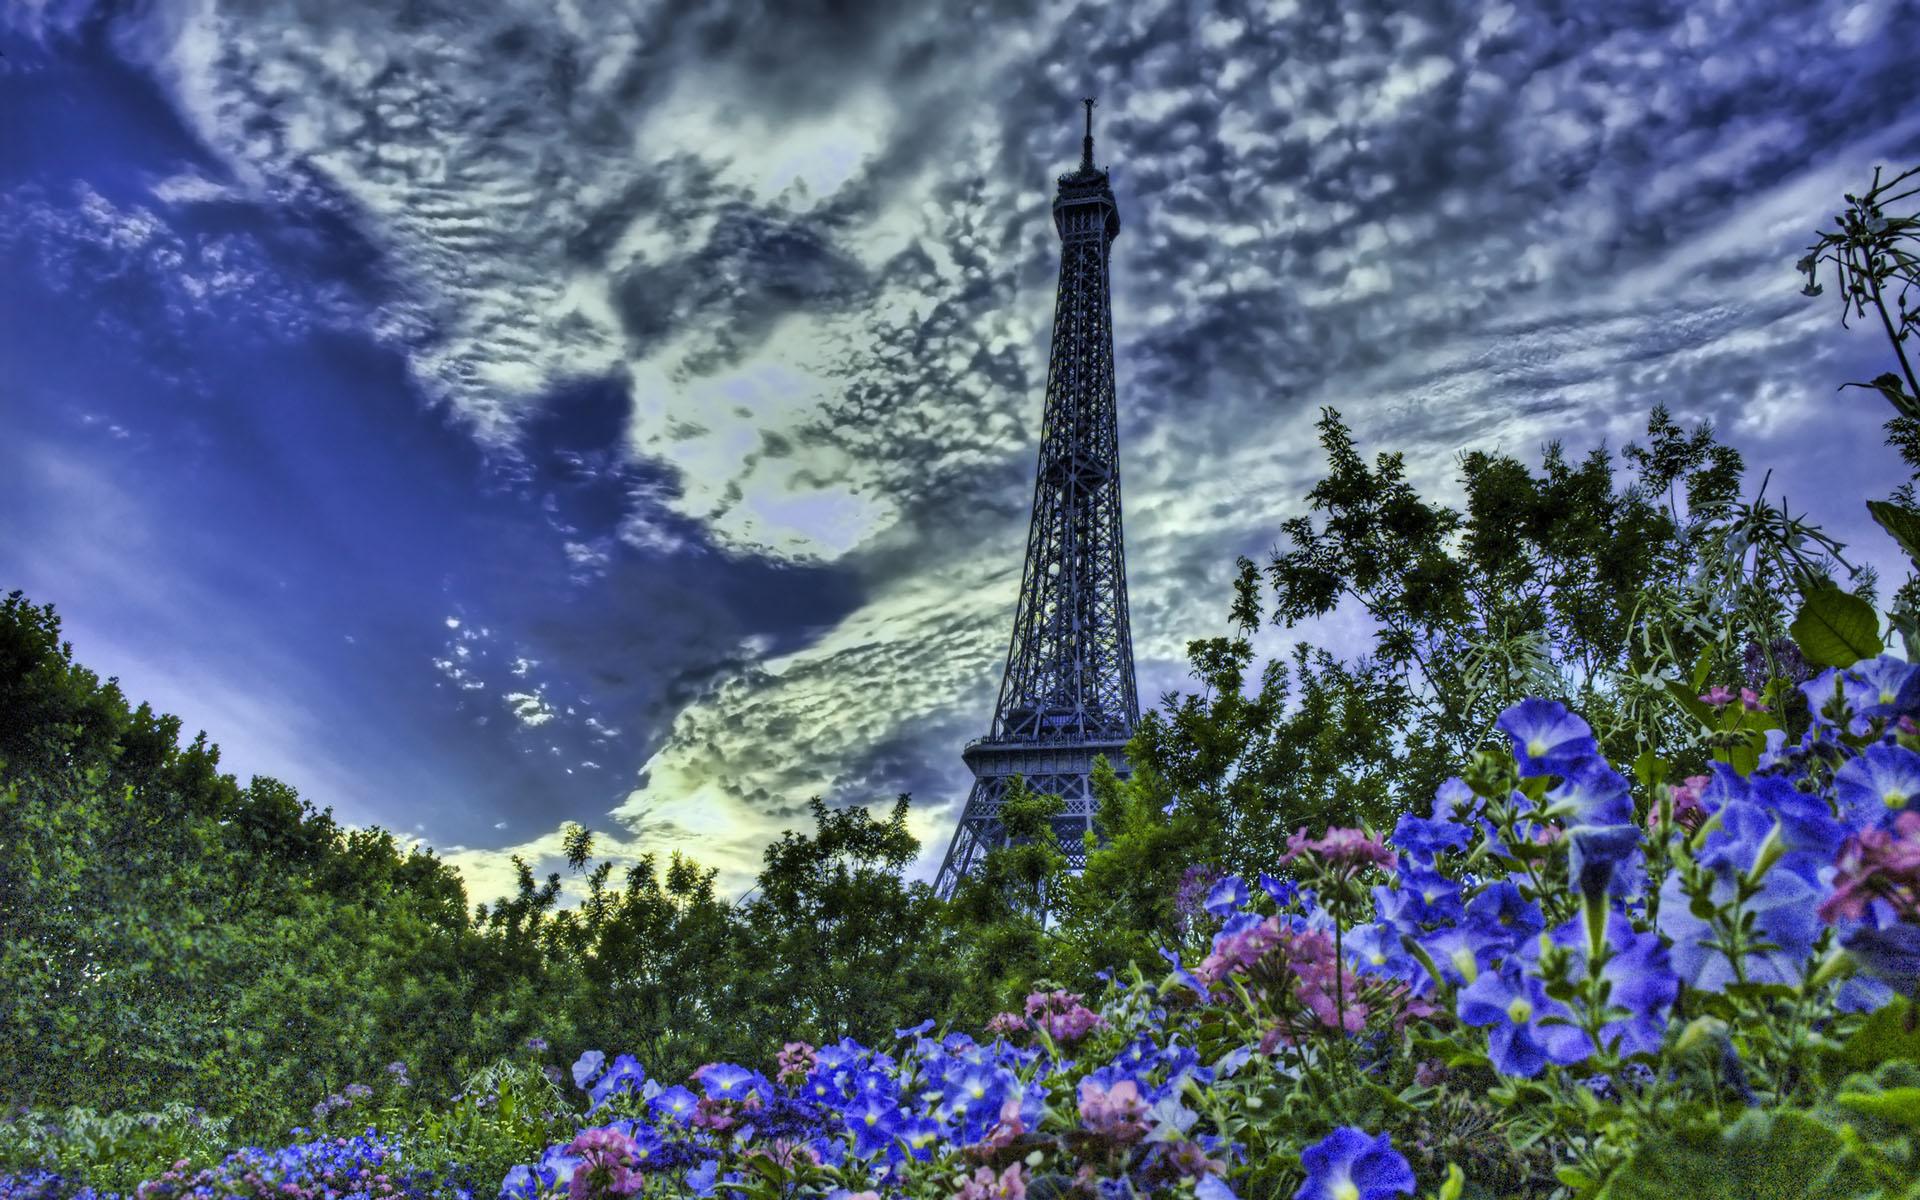 ------* SIEMPRE NOS QUEDARA PARIS *------ Nature-manipulated-photo-digital-wallcoo-wallpaper-photoshop-landscape-85925